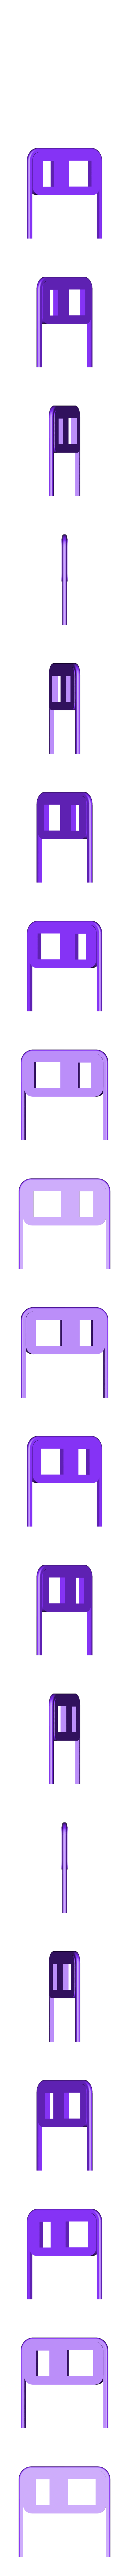 G support éclairage ARD.STL Download STL file Draisine Matisa for LGB • 3D printable object, biddle